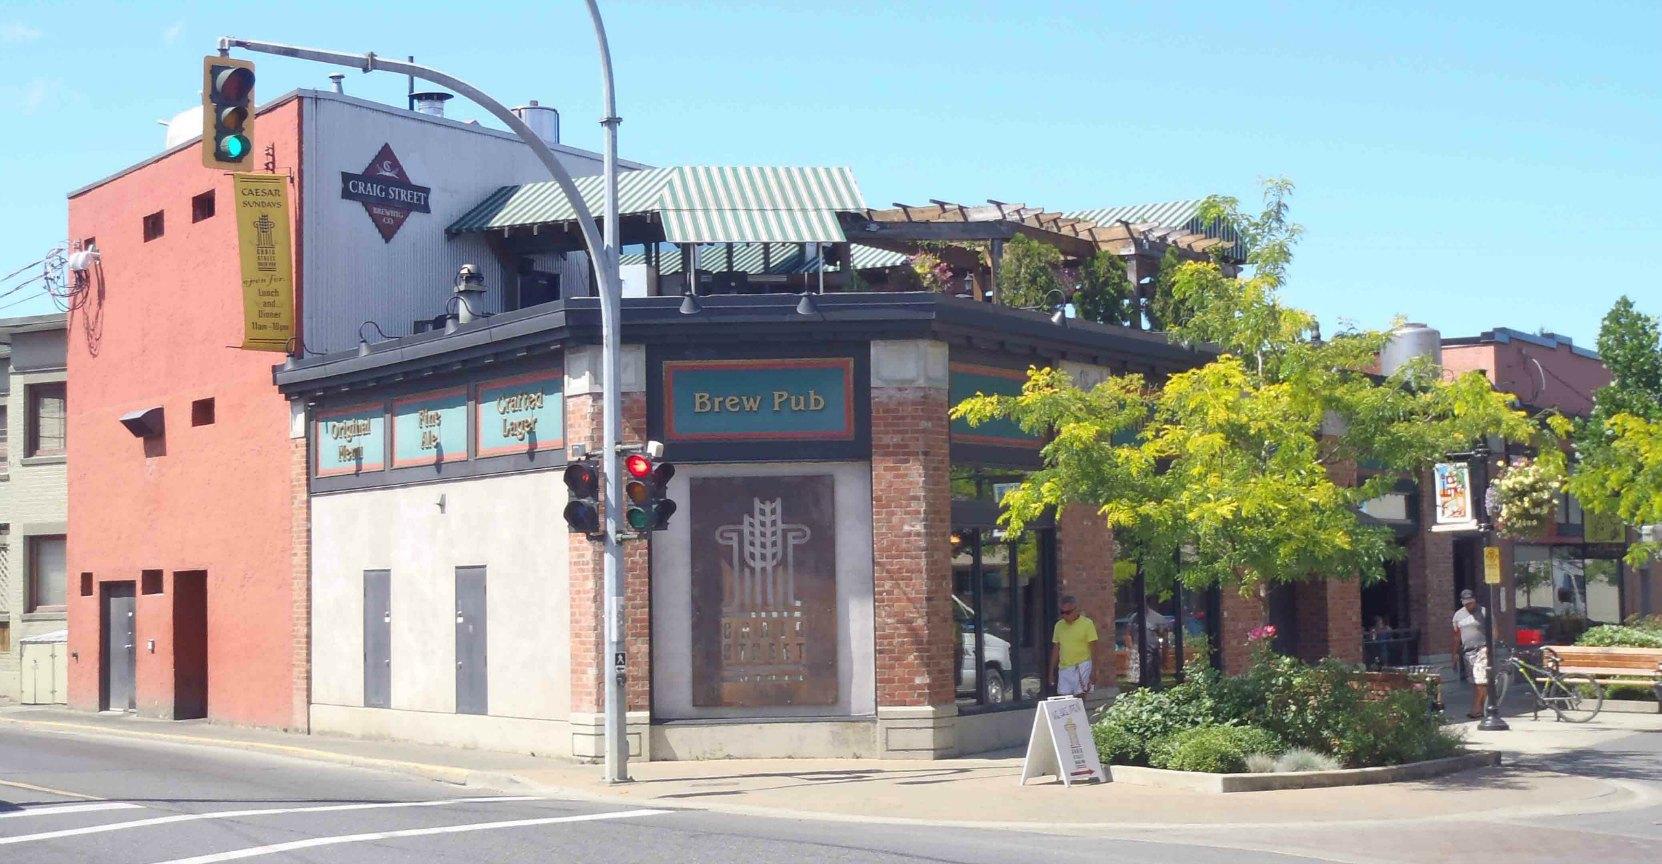 Craig Street Brew Pub, 25 Craig Street, Duncan, B.C.